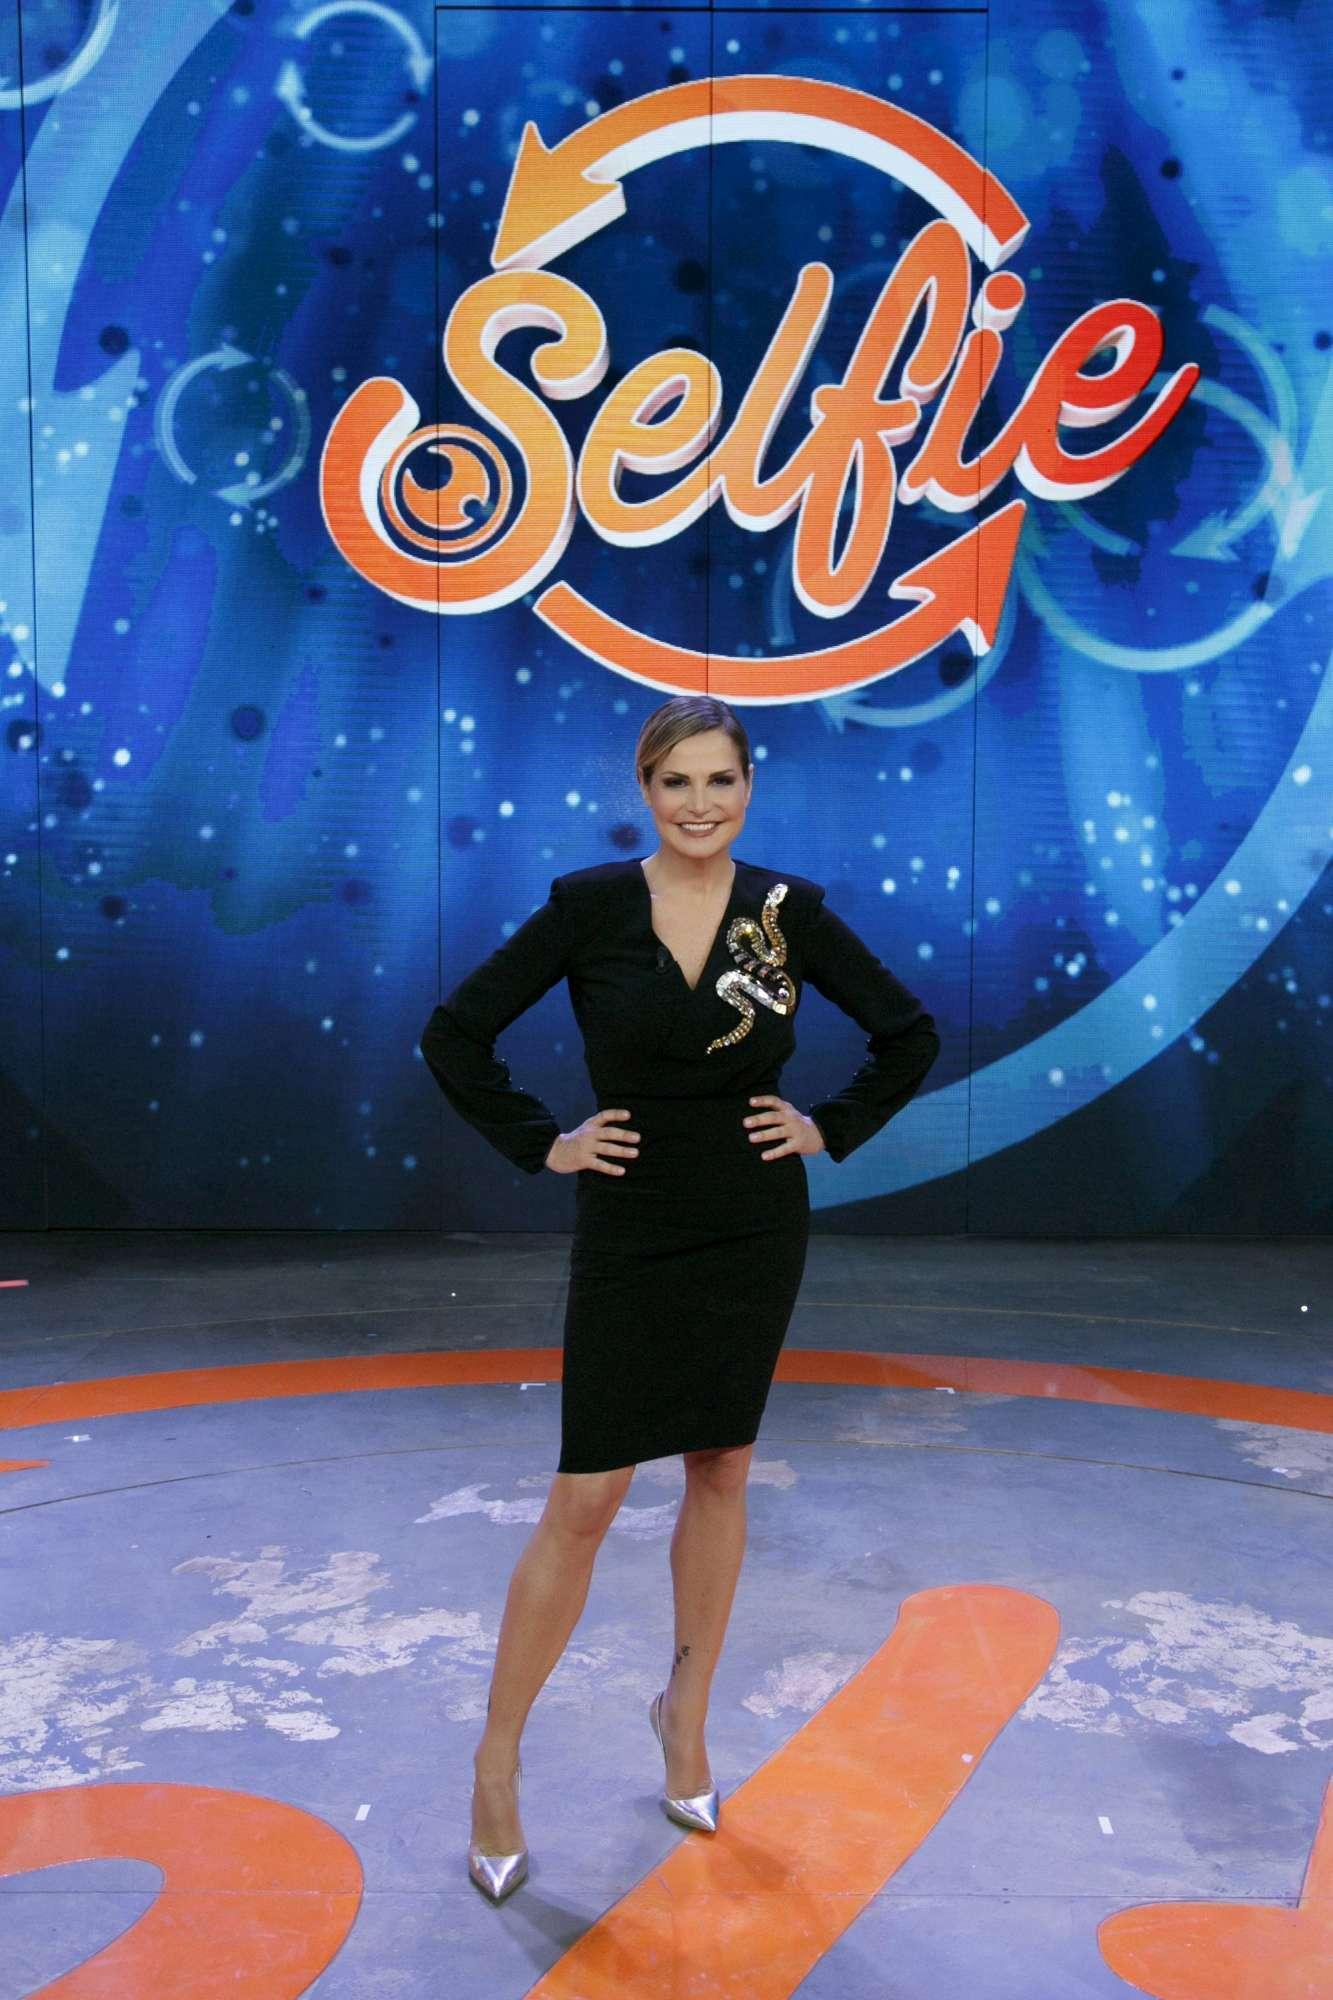 Selfie, stasera la seconda puntata